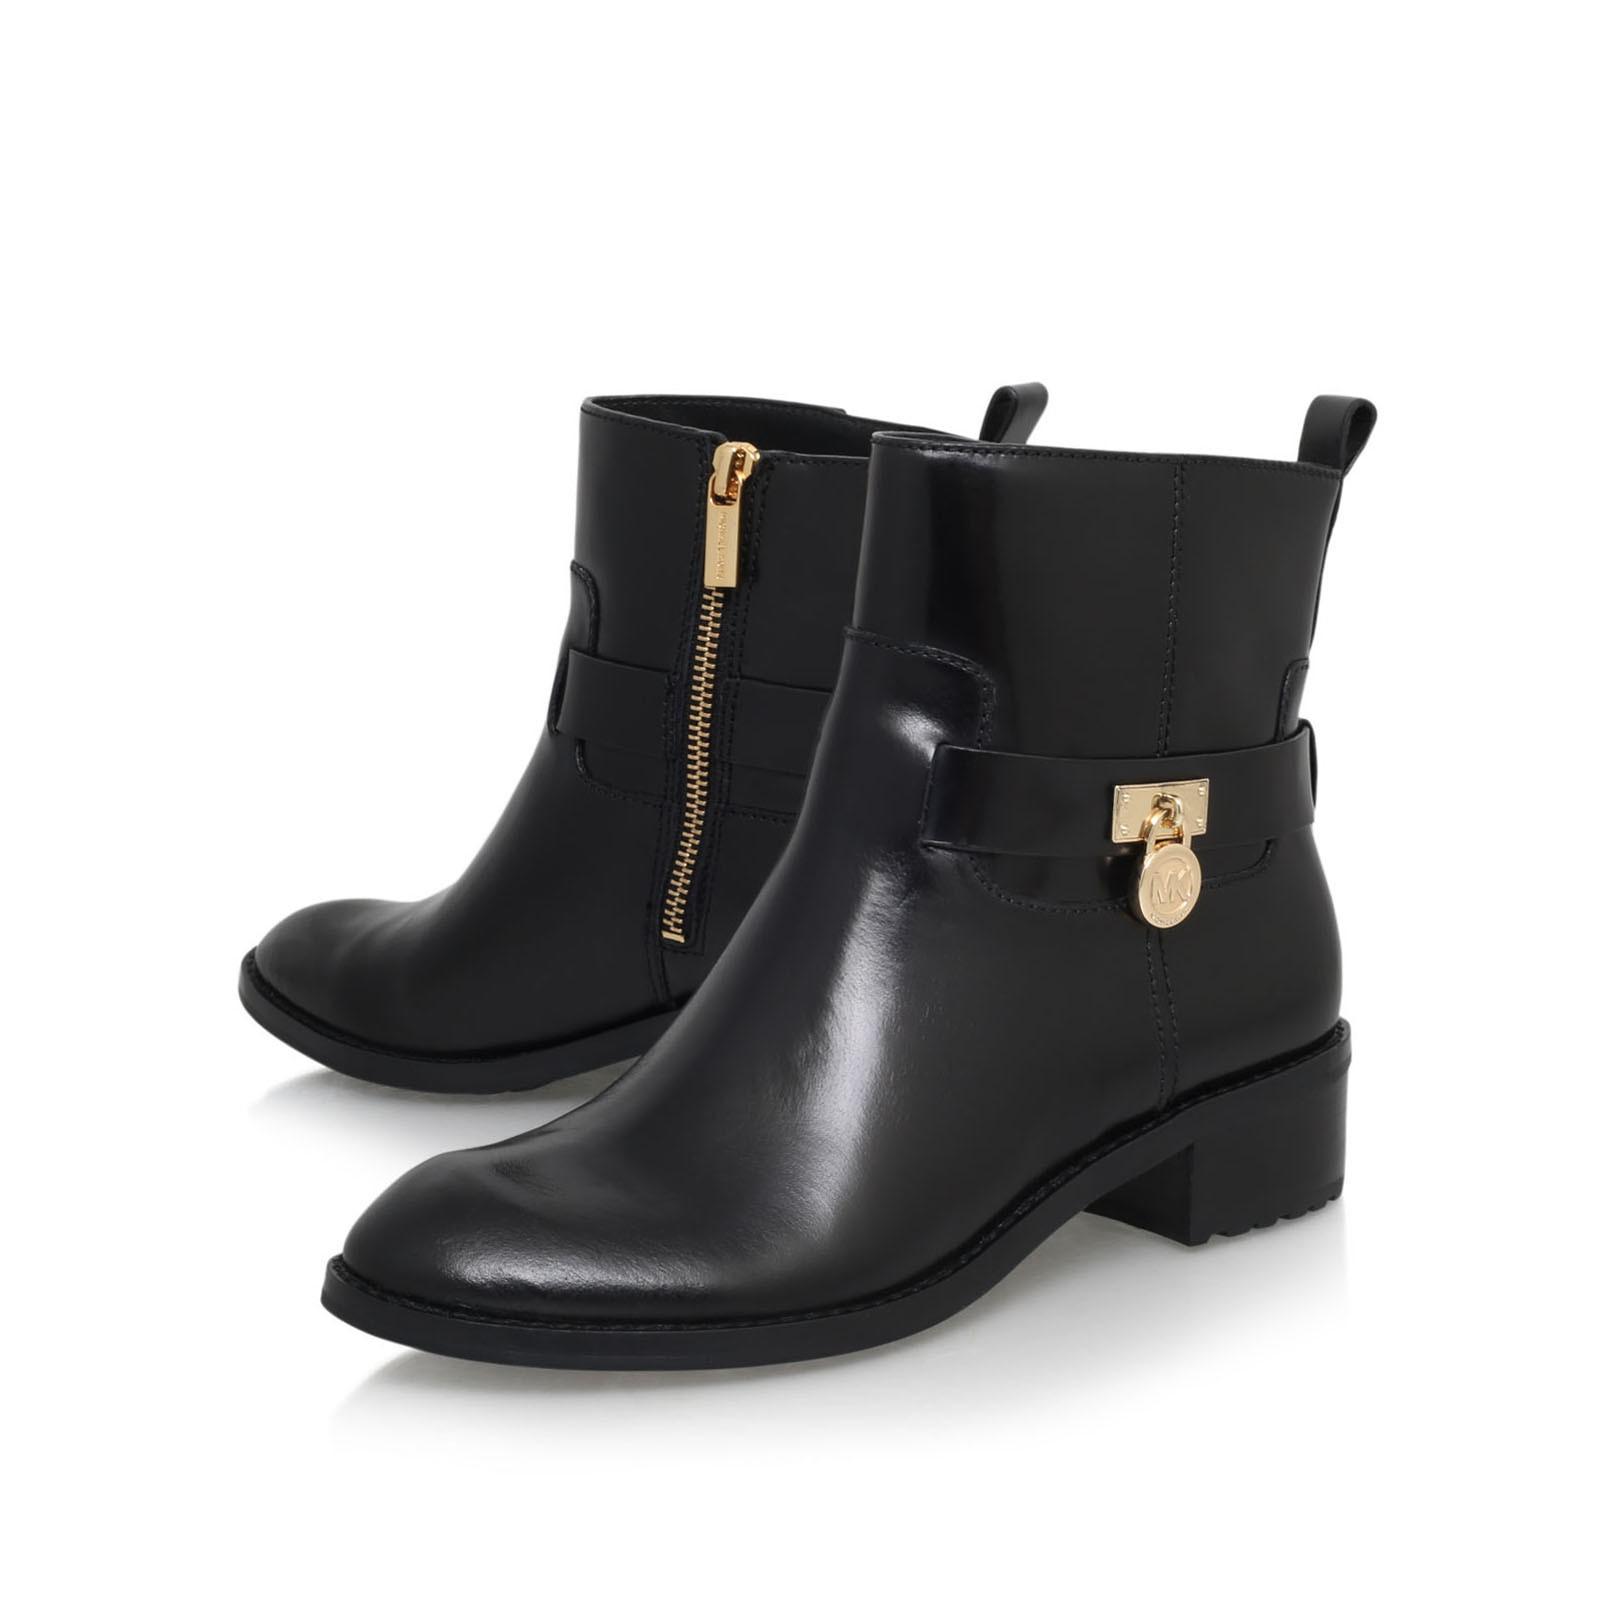 michael michael kors ryan ankle boot in black lyst. Black Bedroom Furniture Sets. Home Design Ideas